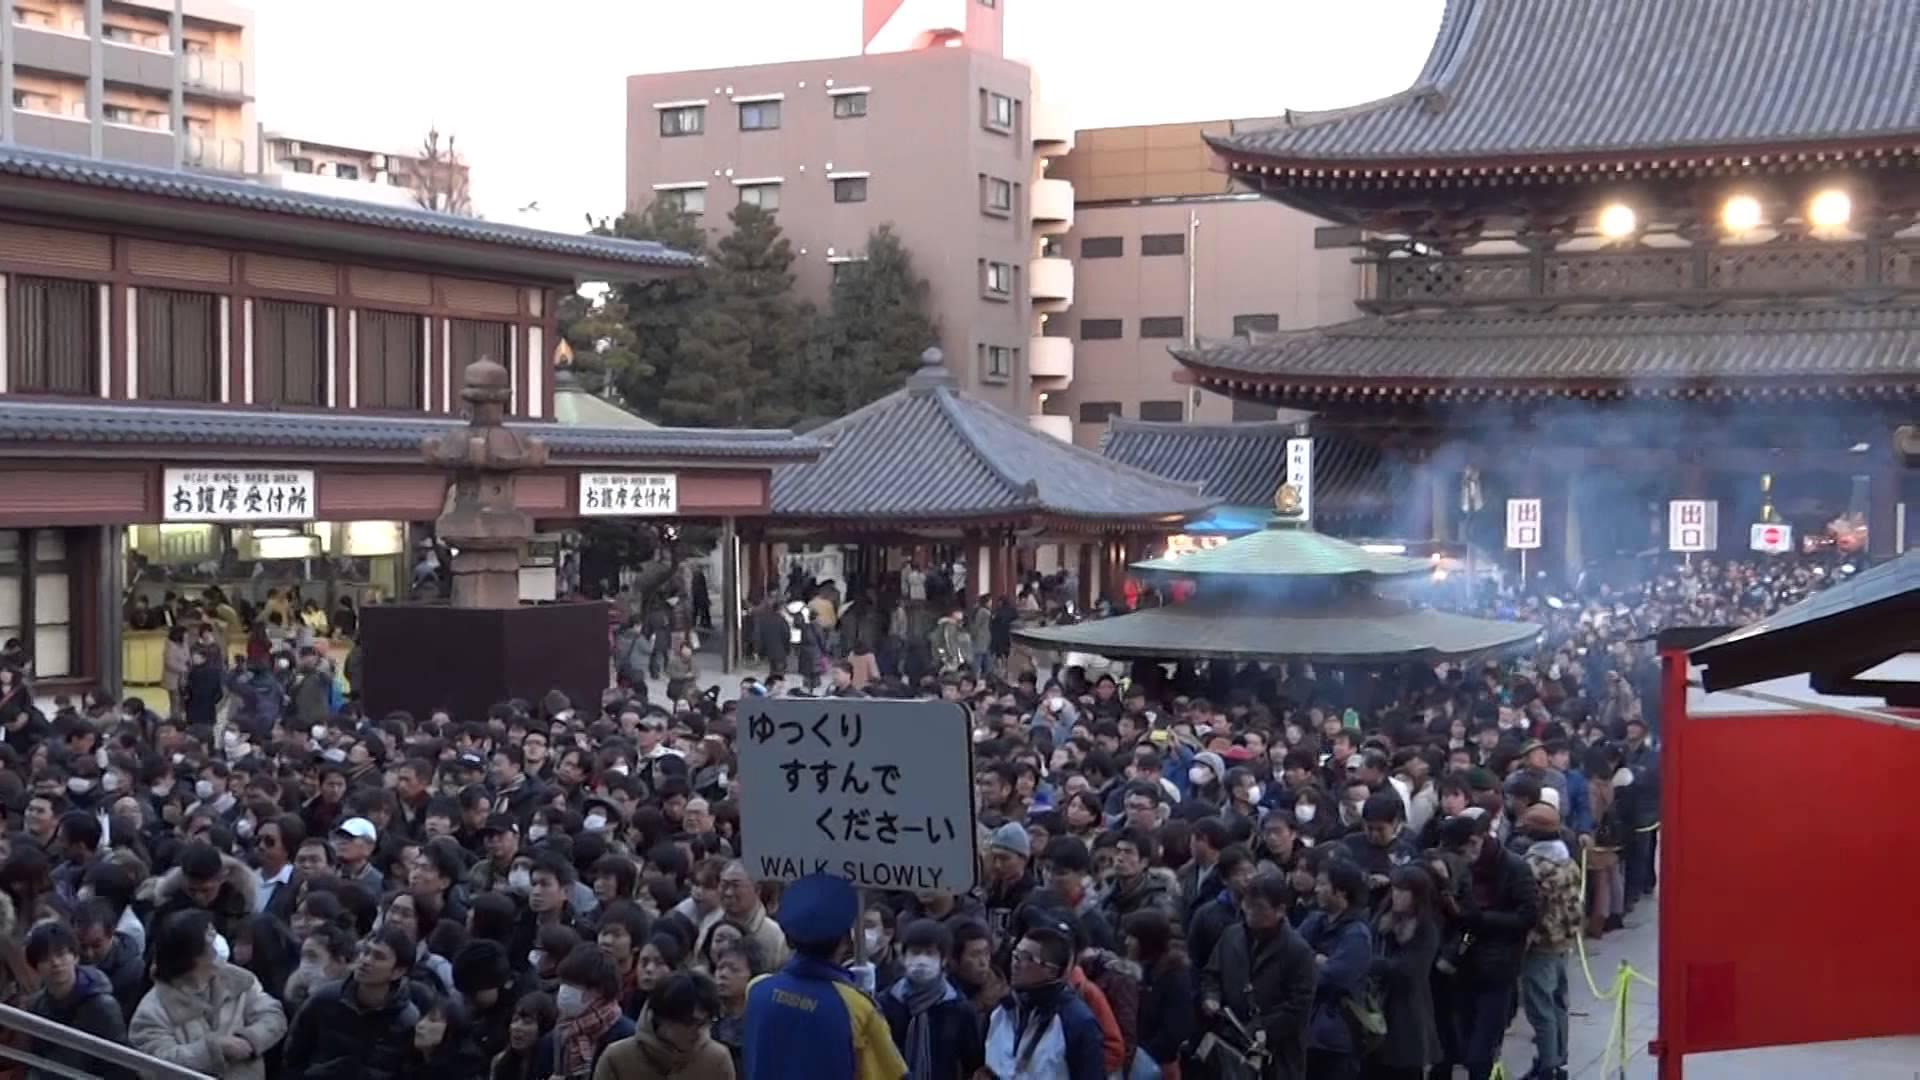 maxresdefault 1 - Кавасаки Дайси: храм, спасающий от зла